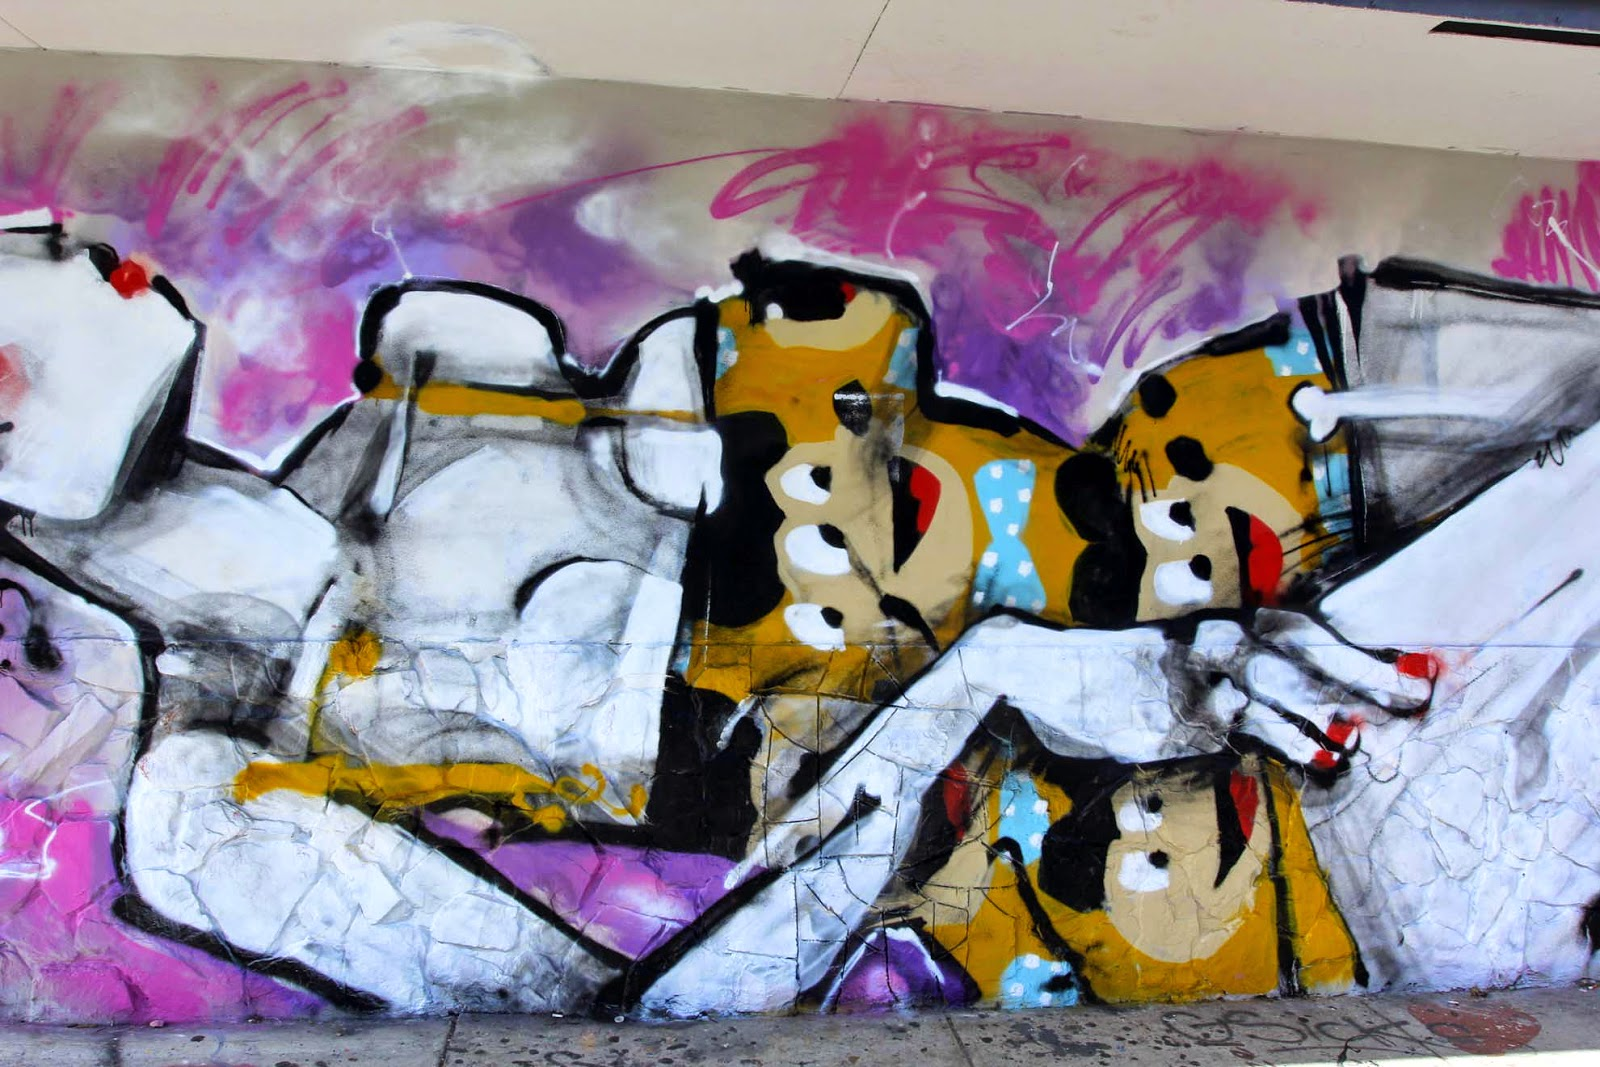 anthony-lister-new-mural-at-art-basel-2014-04